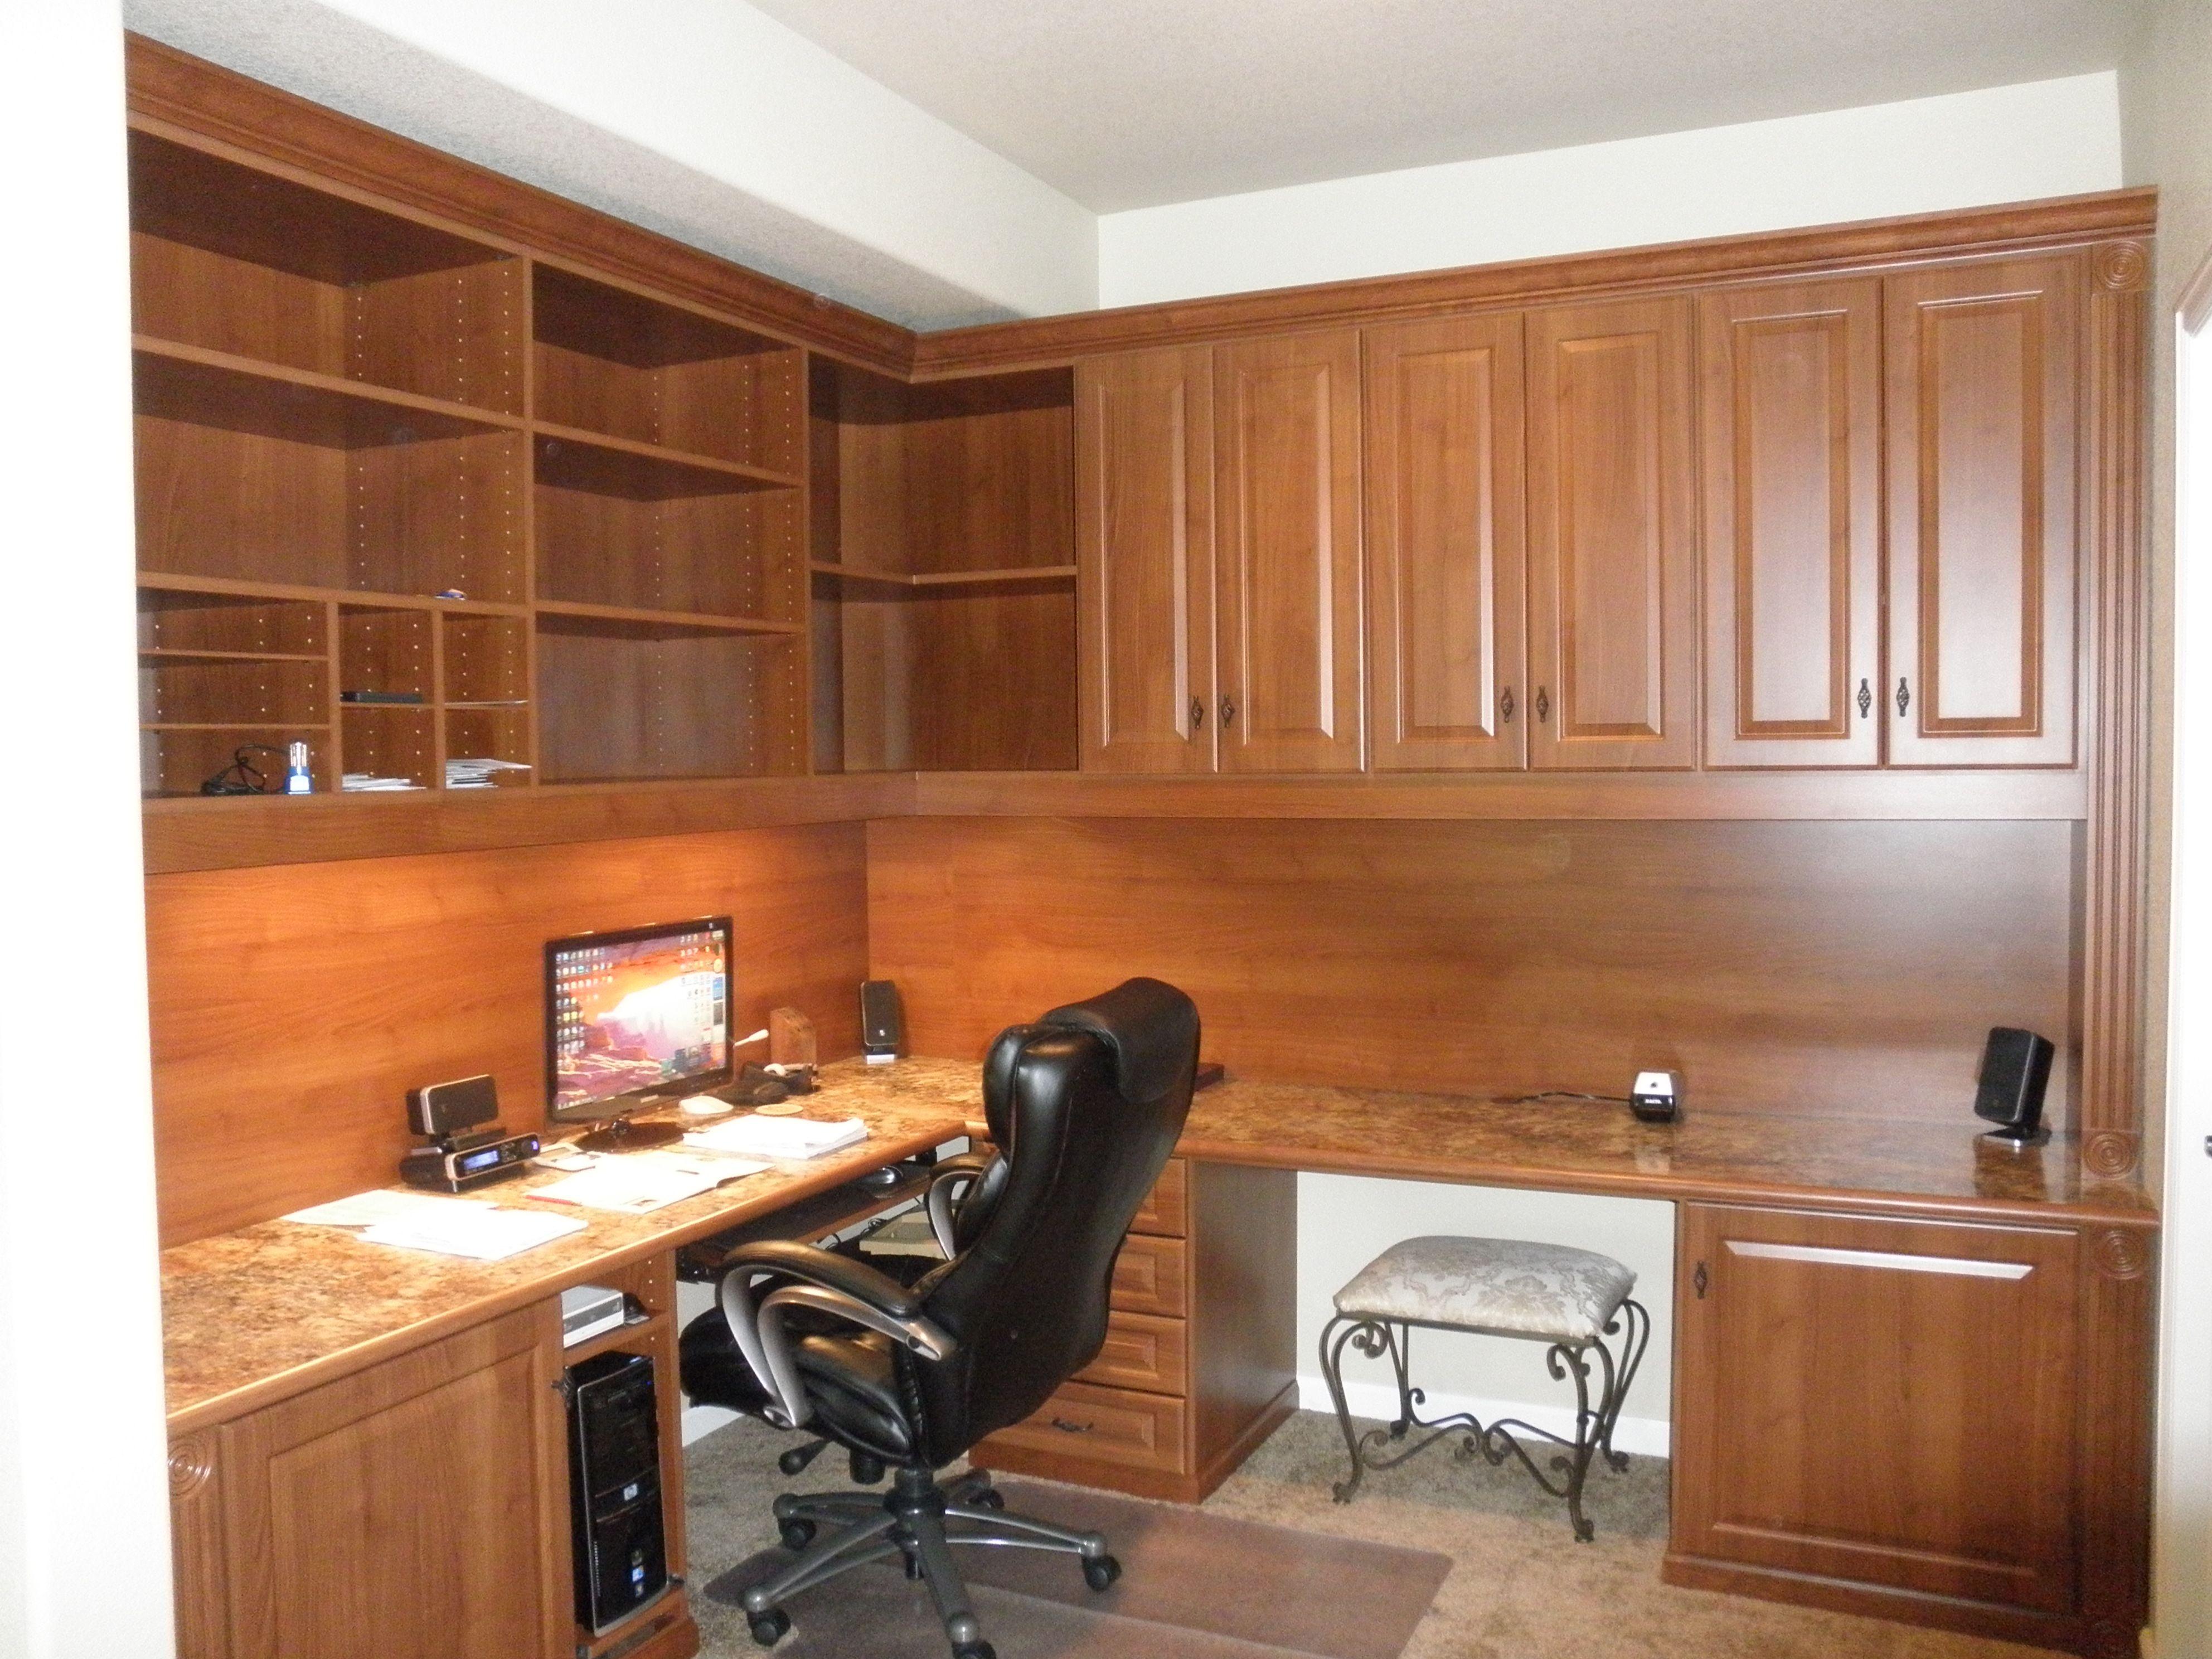 custom office desk designs. Custom Office Desk - Google Search Designs E